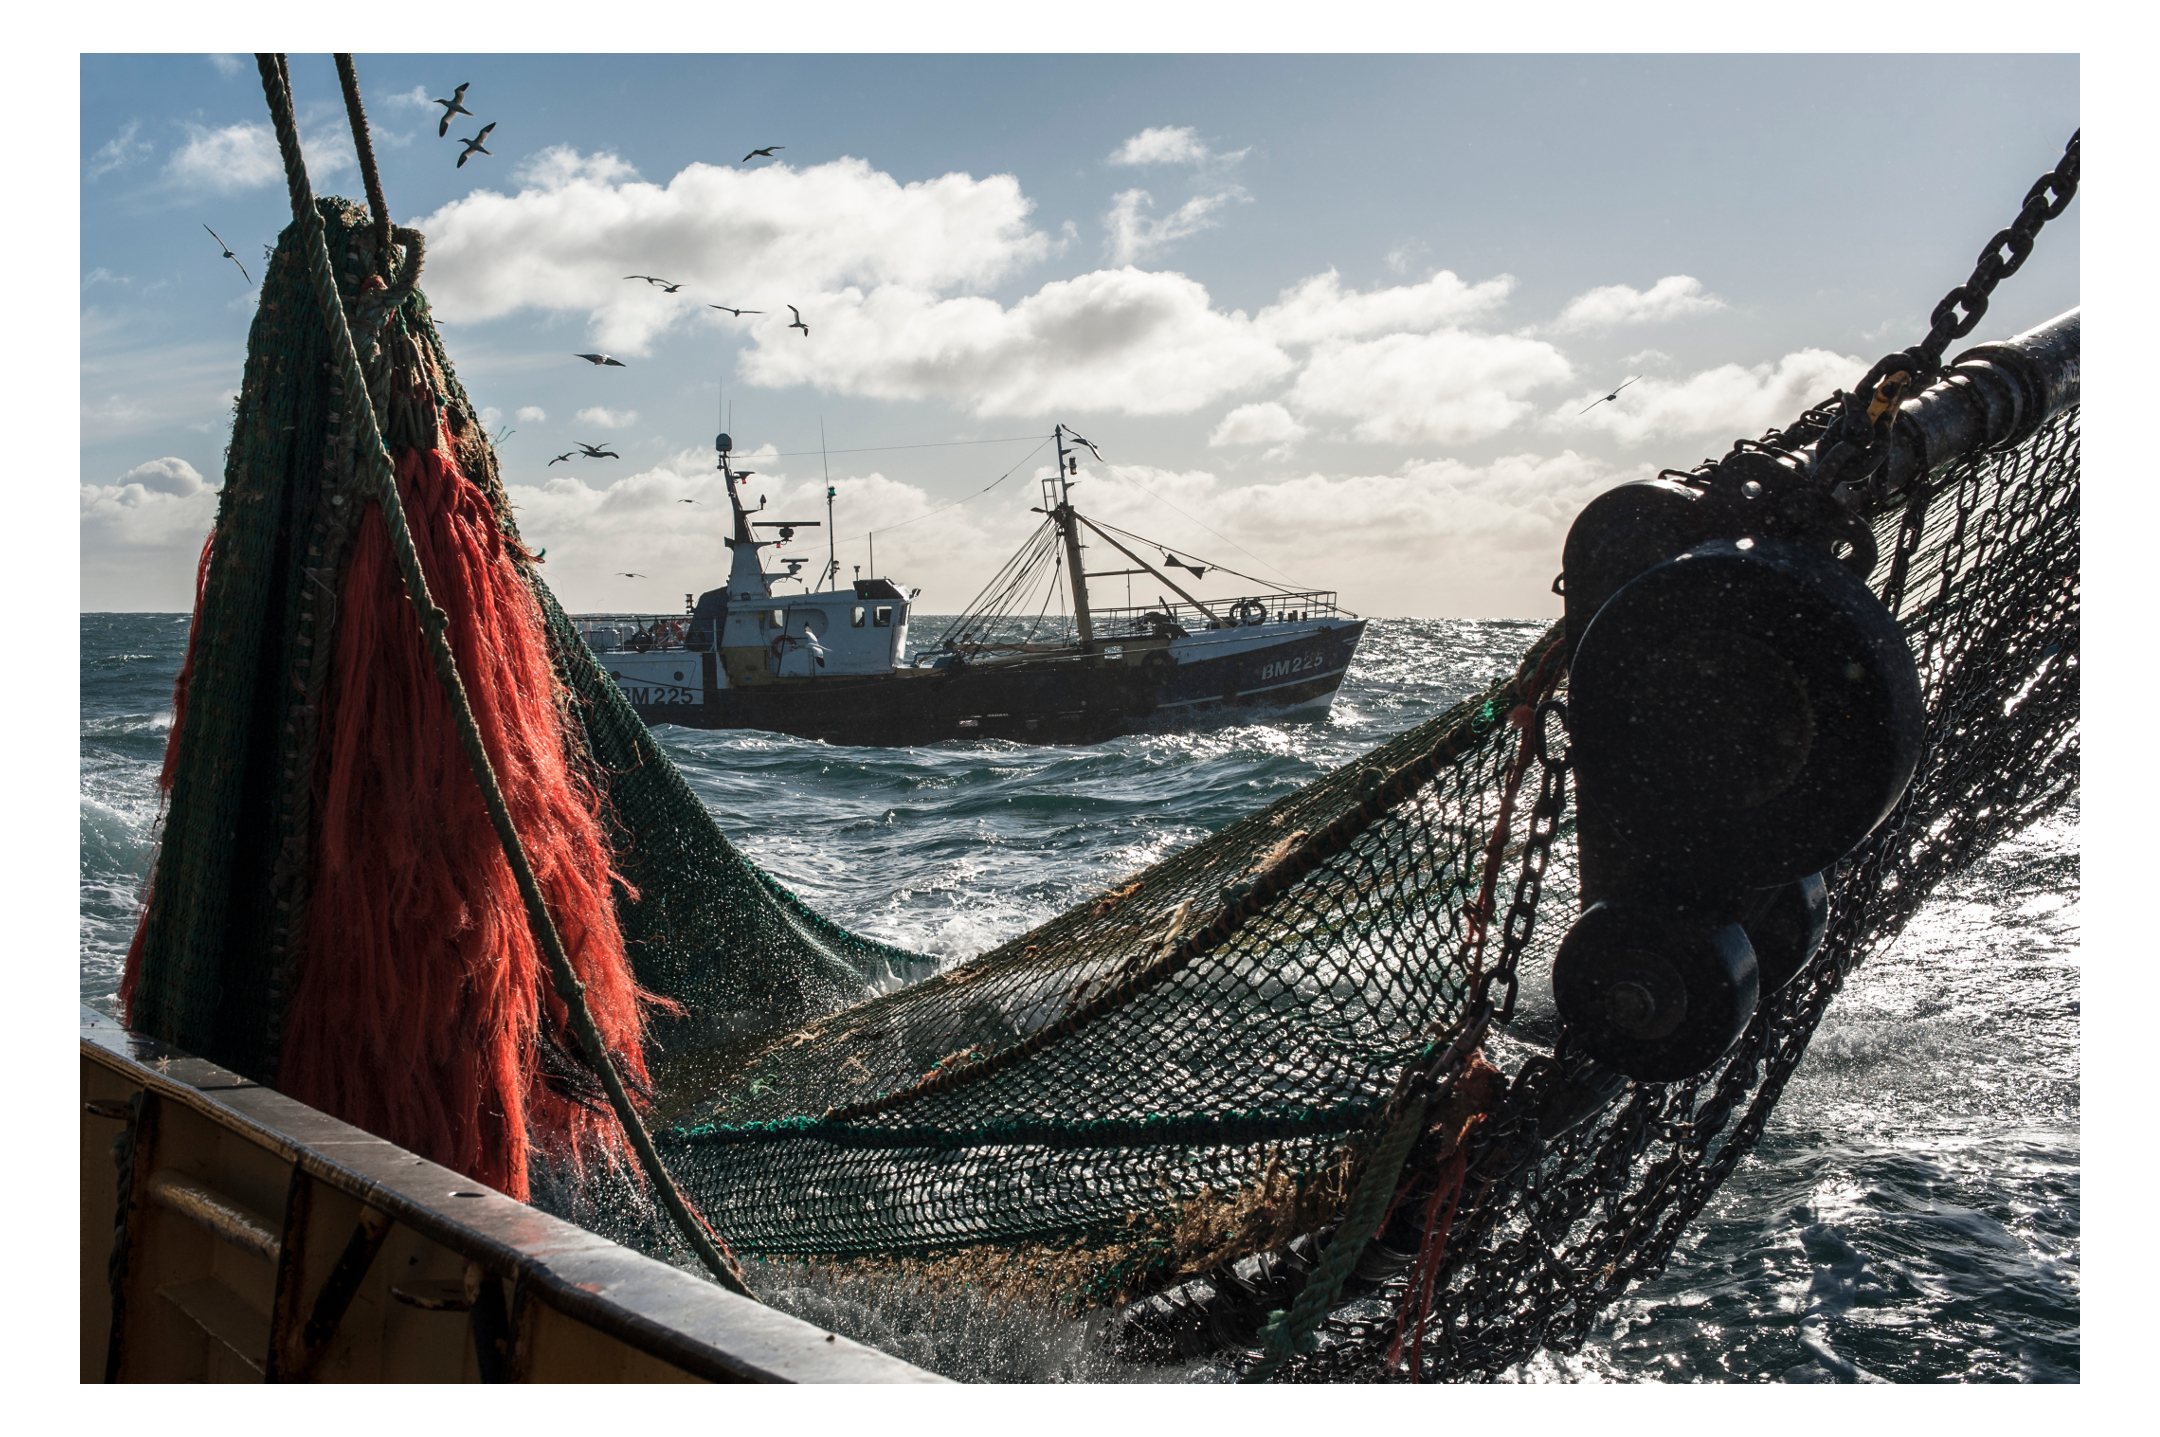 waterdance_beam_trawlers_8.jpg